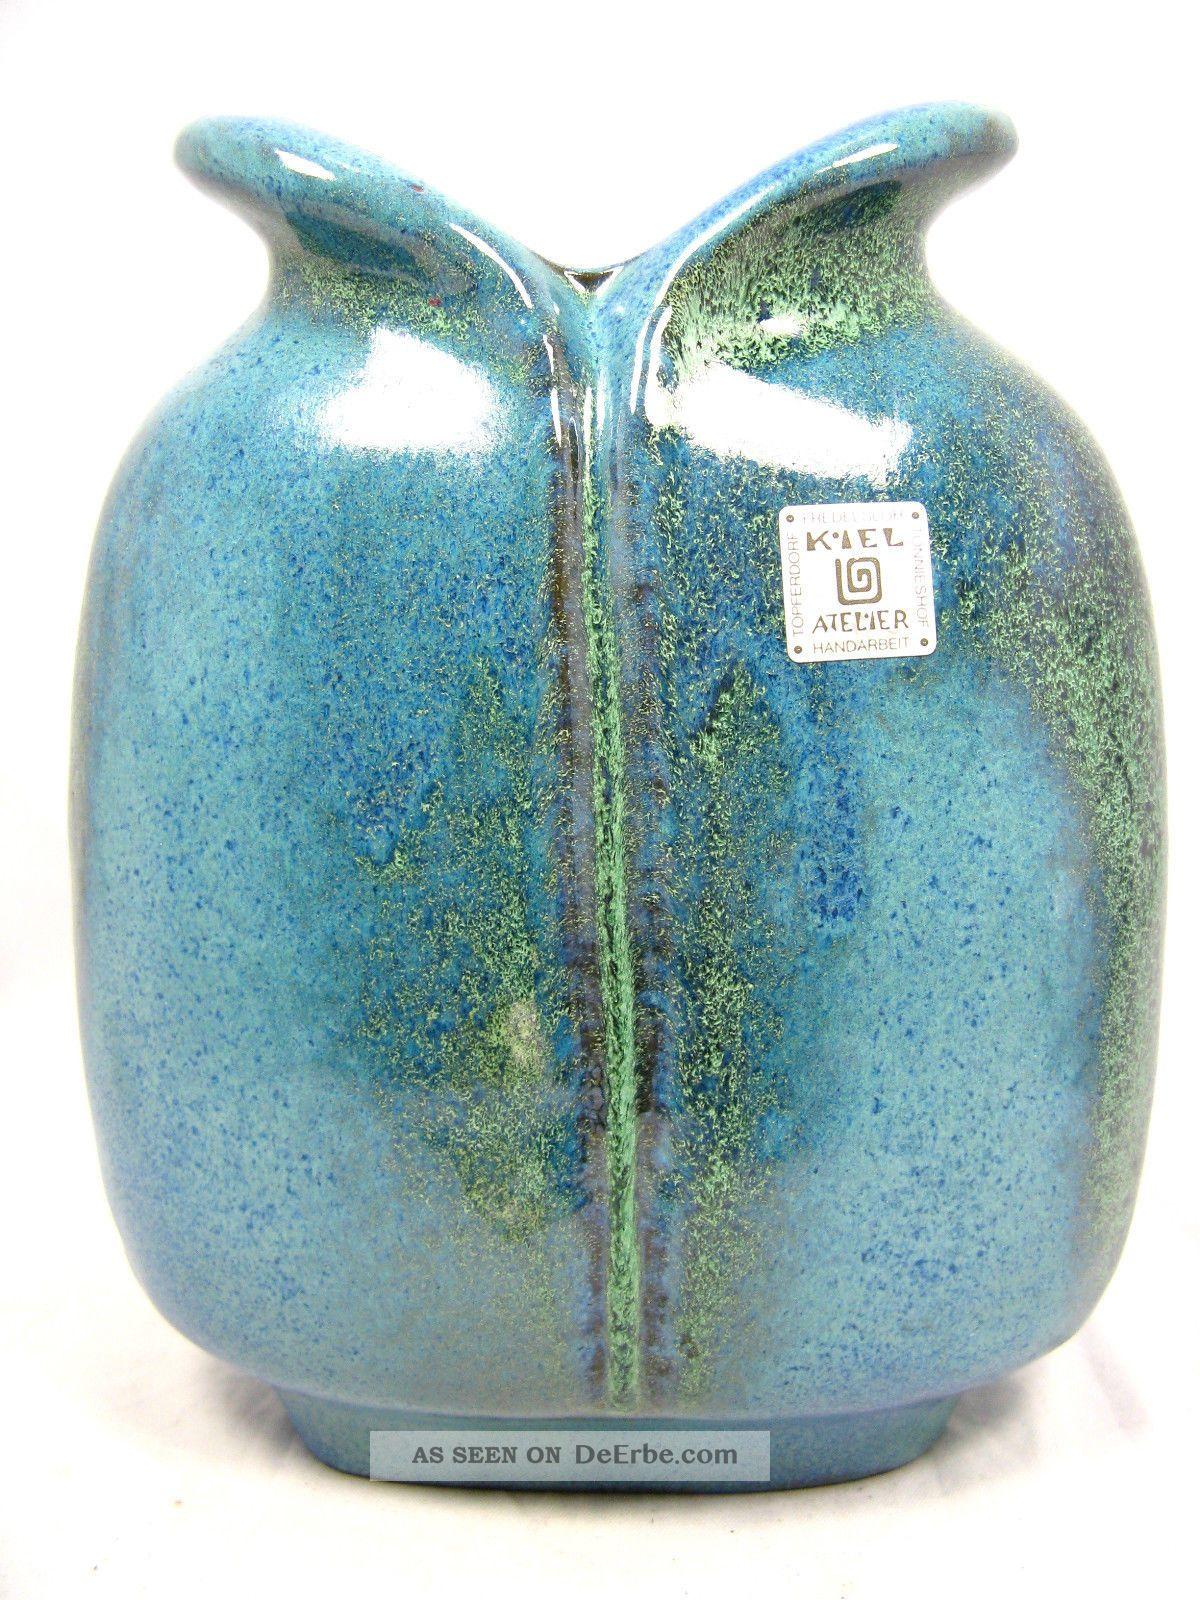 Keramik Bemalen Kiel : seltene carstens keramik vase kiel atelier gemeinschaft t nnieshof 20 cm ~ Eleganceandgraceweddings.com Haus und Dekorationen